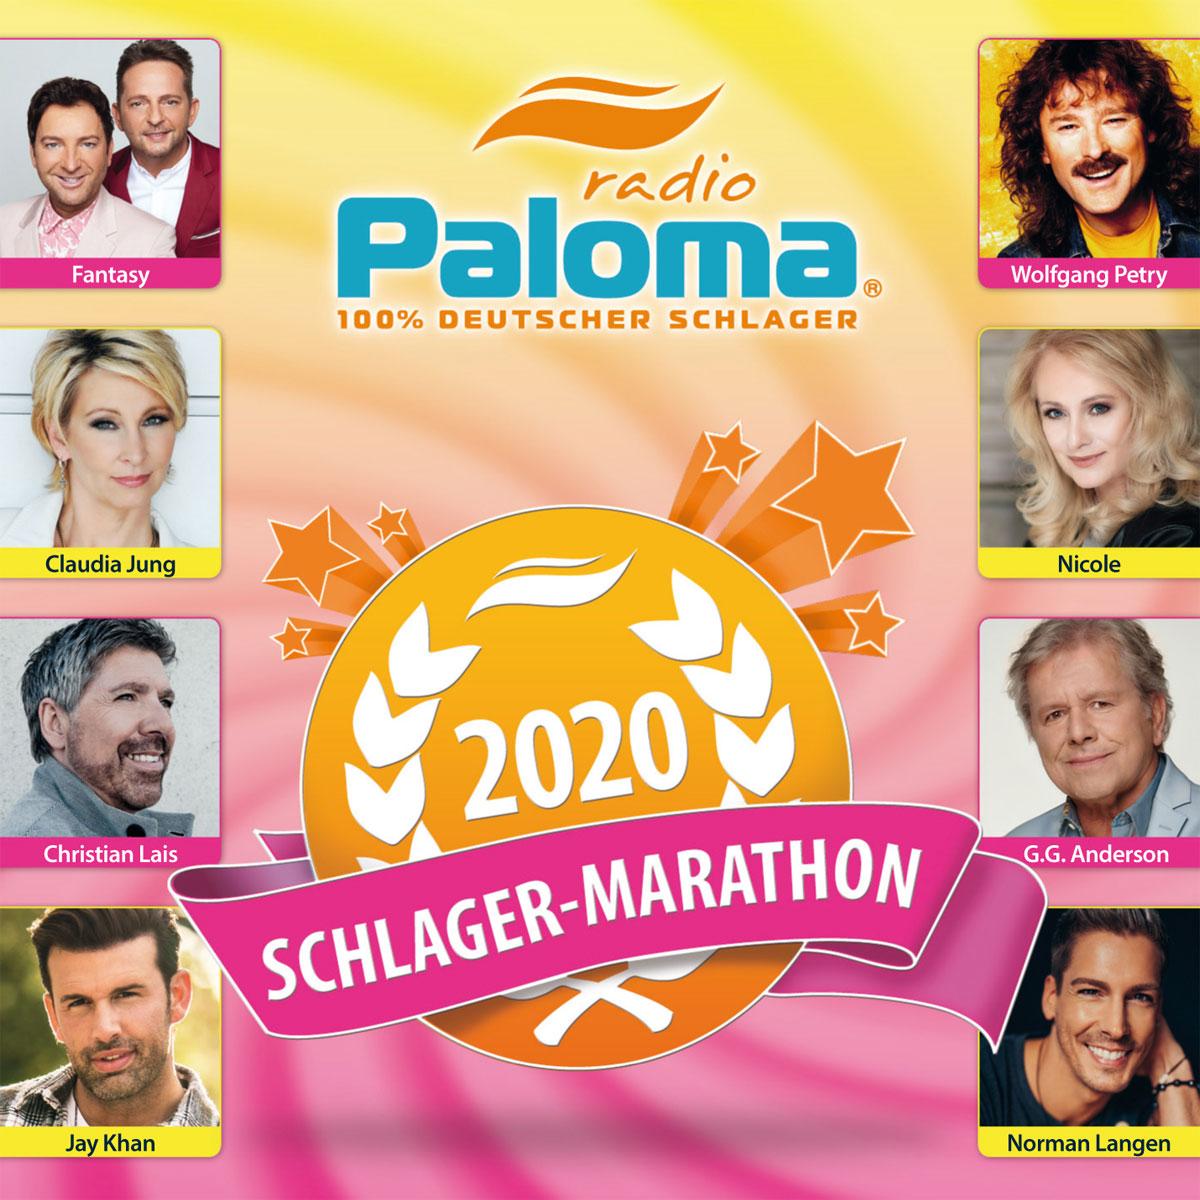 RADIO PALOMA - SCHLAGERMARATHON 2020